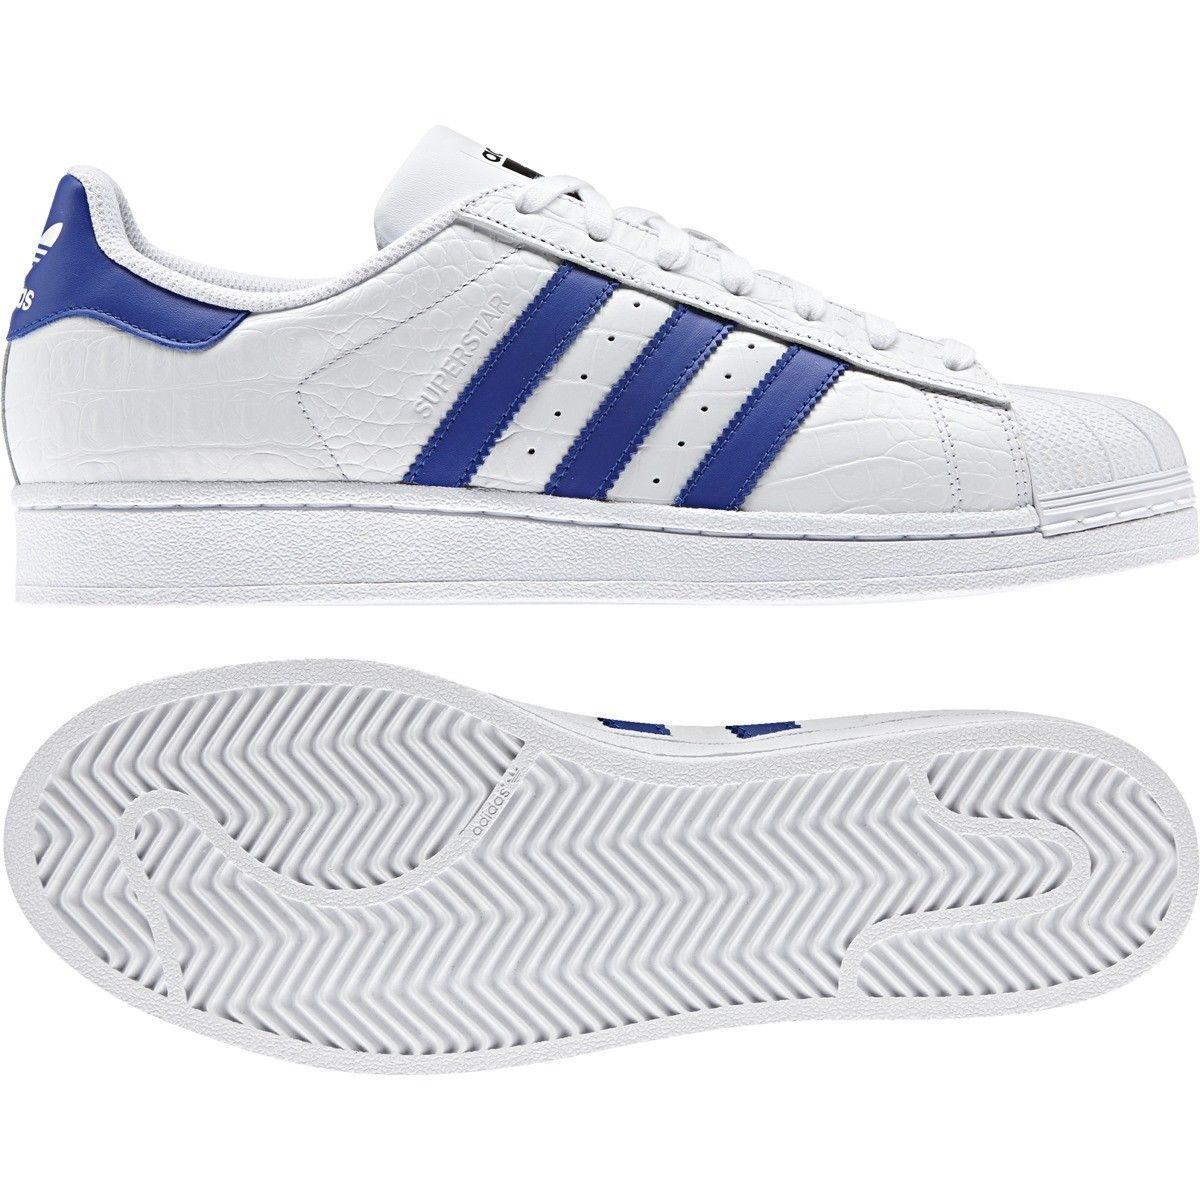 adidas superstar schoenen bestellen